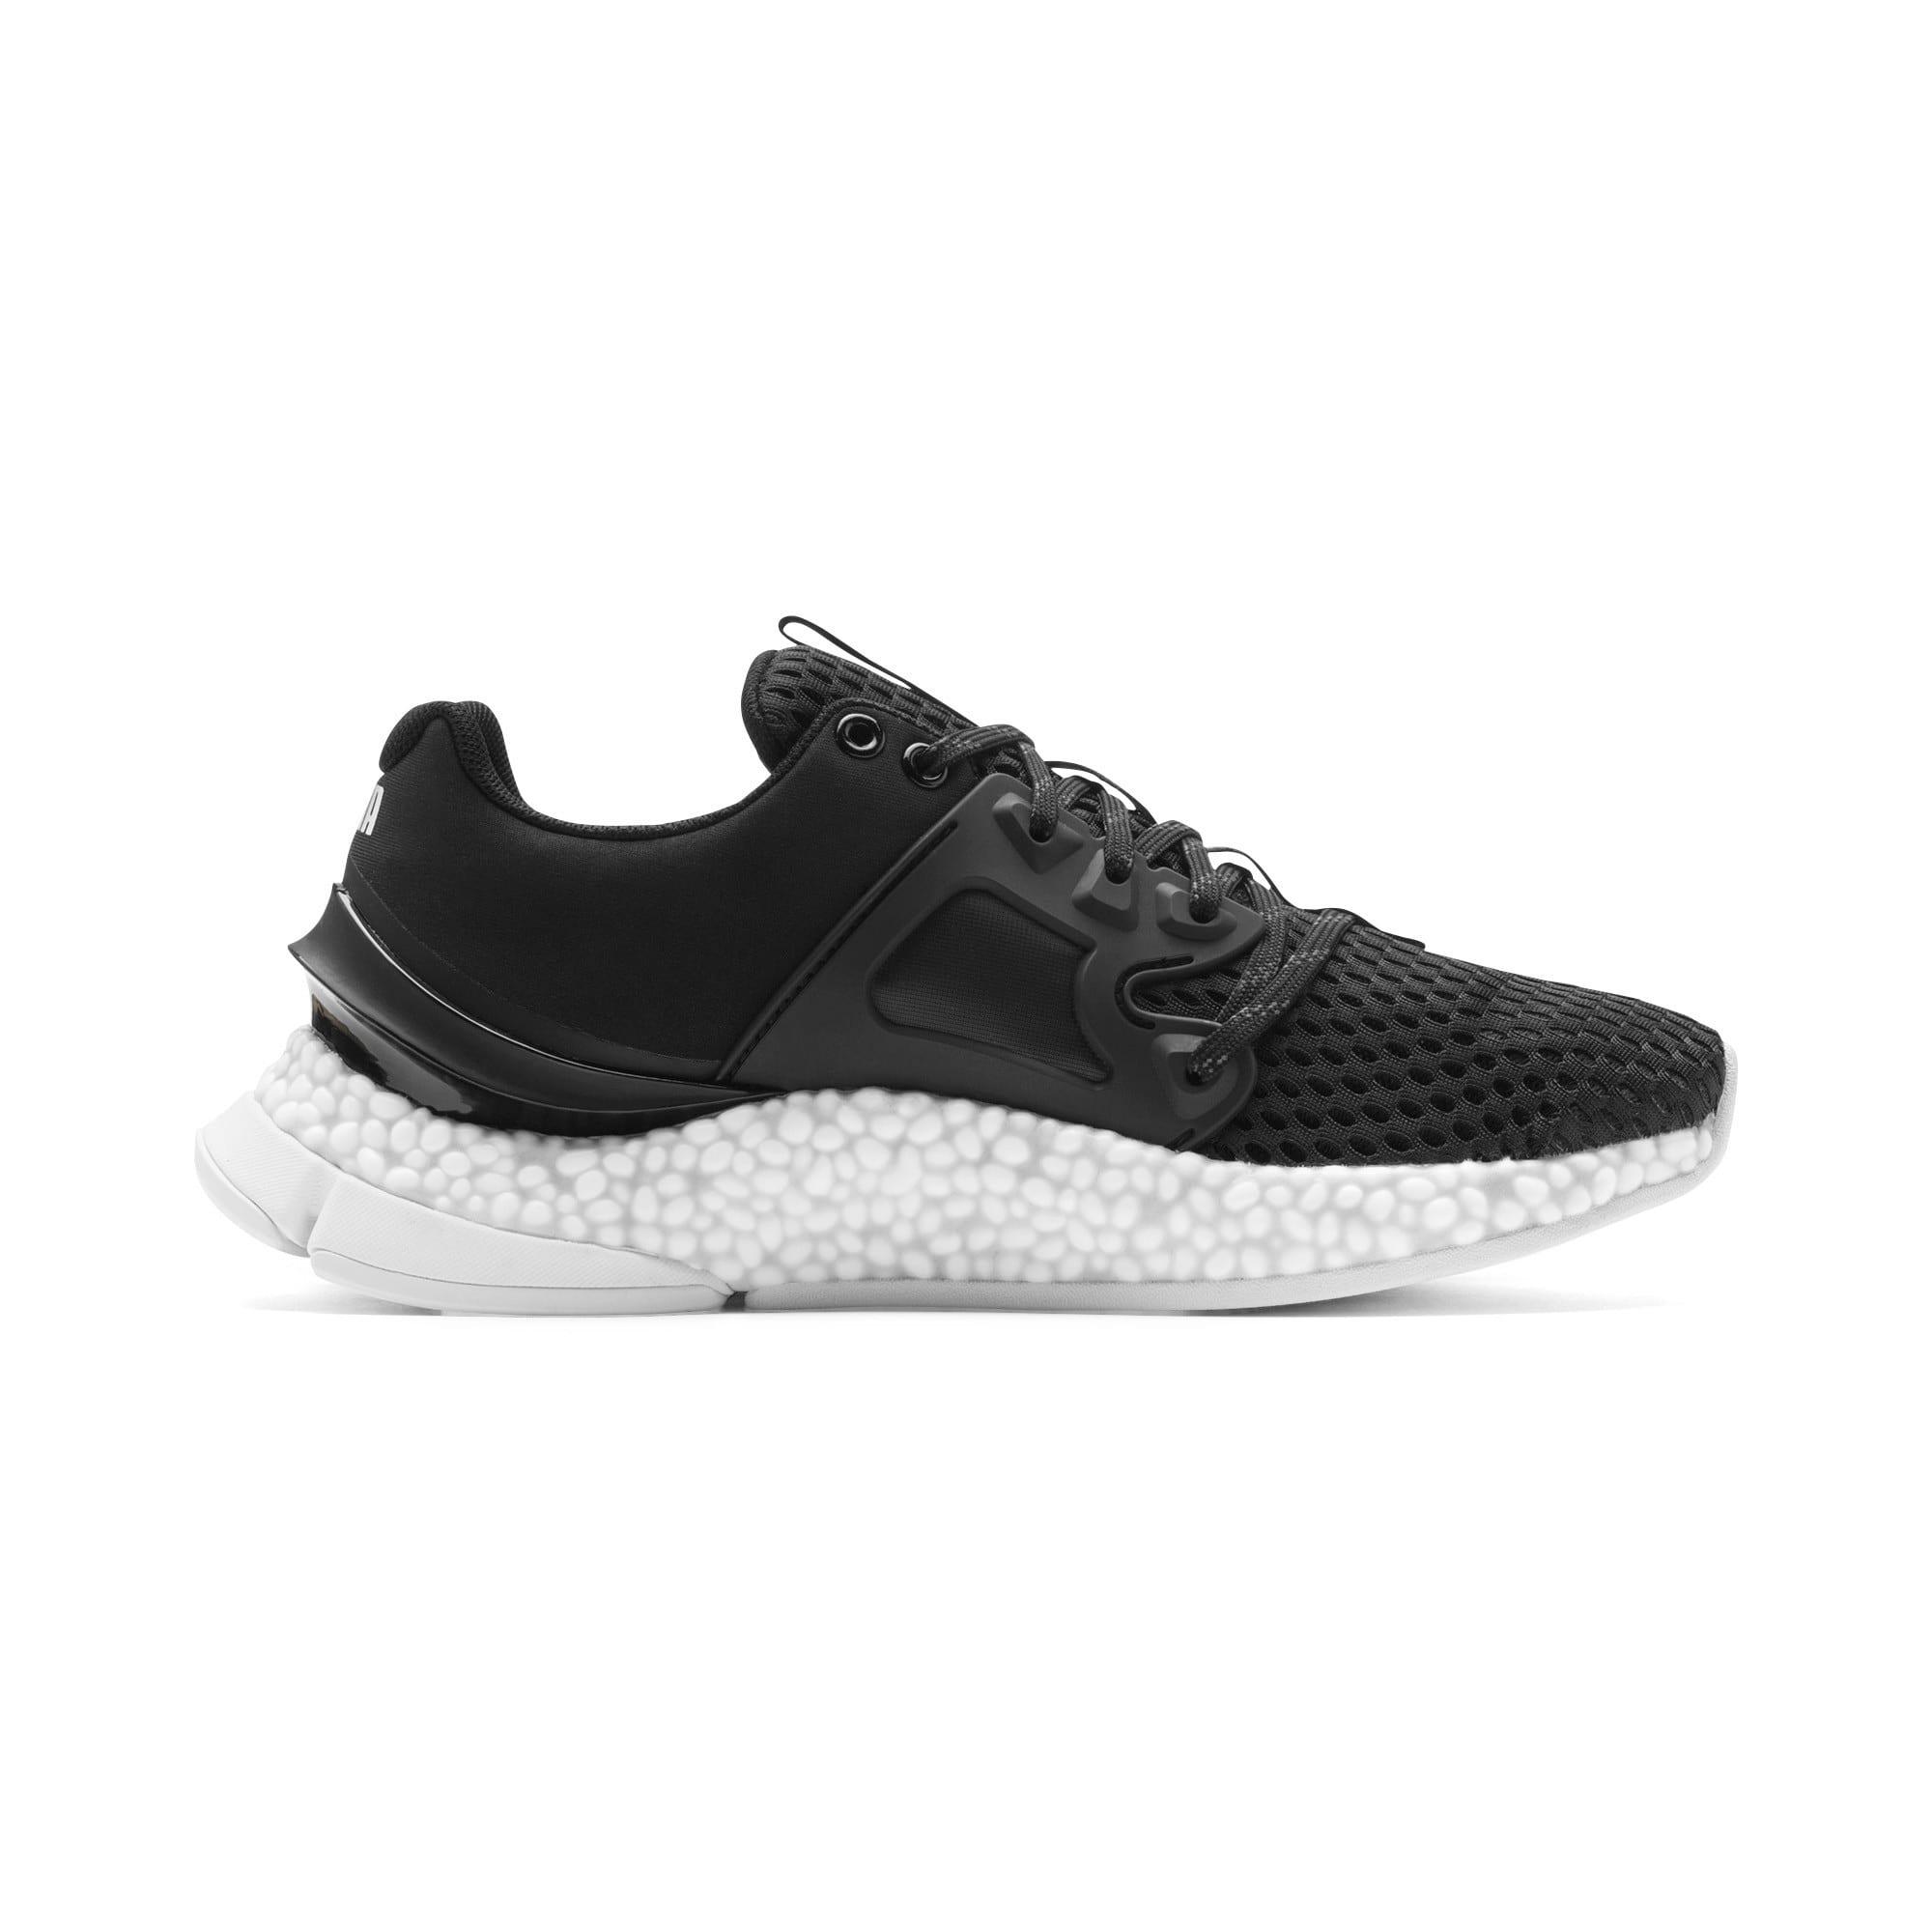 Thumbnail 7 of HYBRID Sky Women's Running Shoes, Puma Black-Puma White, medium